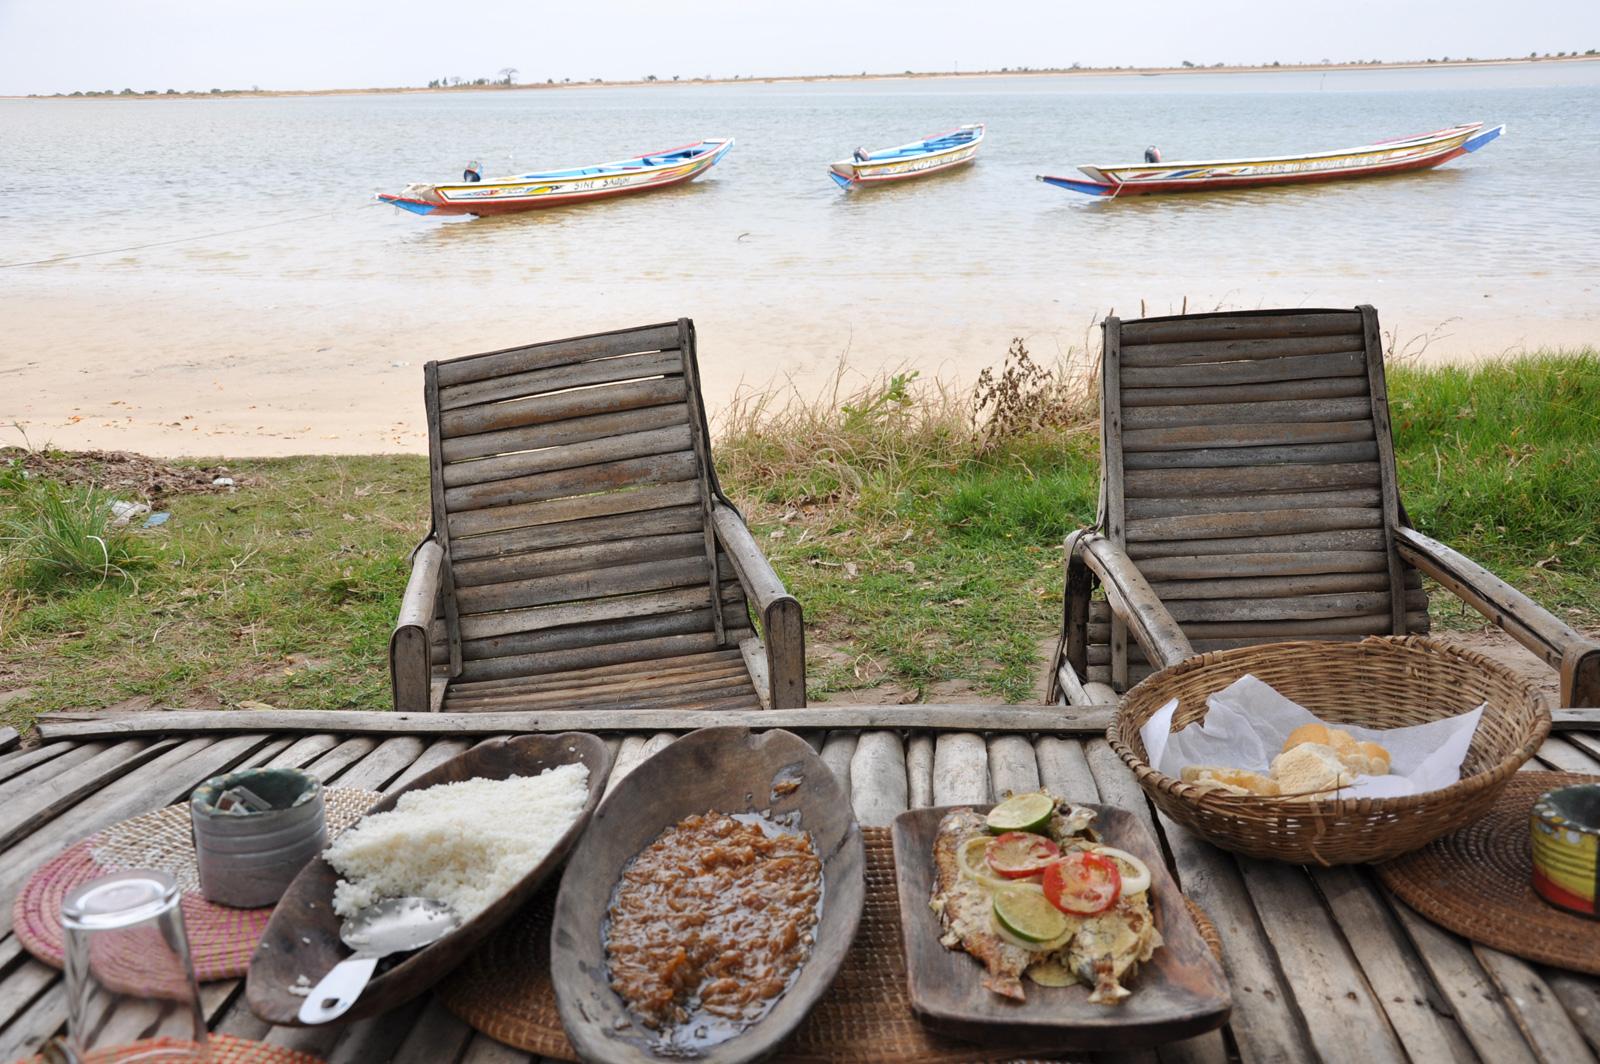 voyage-culinaire-gastronomie-plats-typiques-Senegal-OliverTrips-2